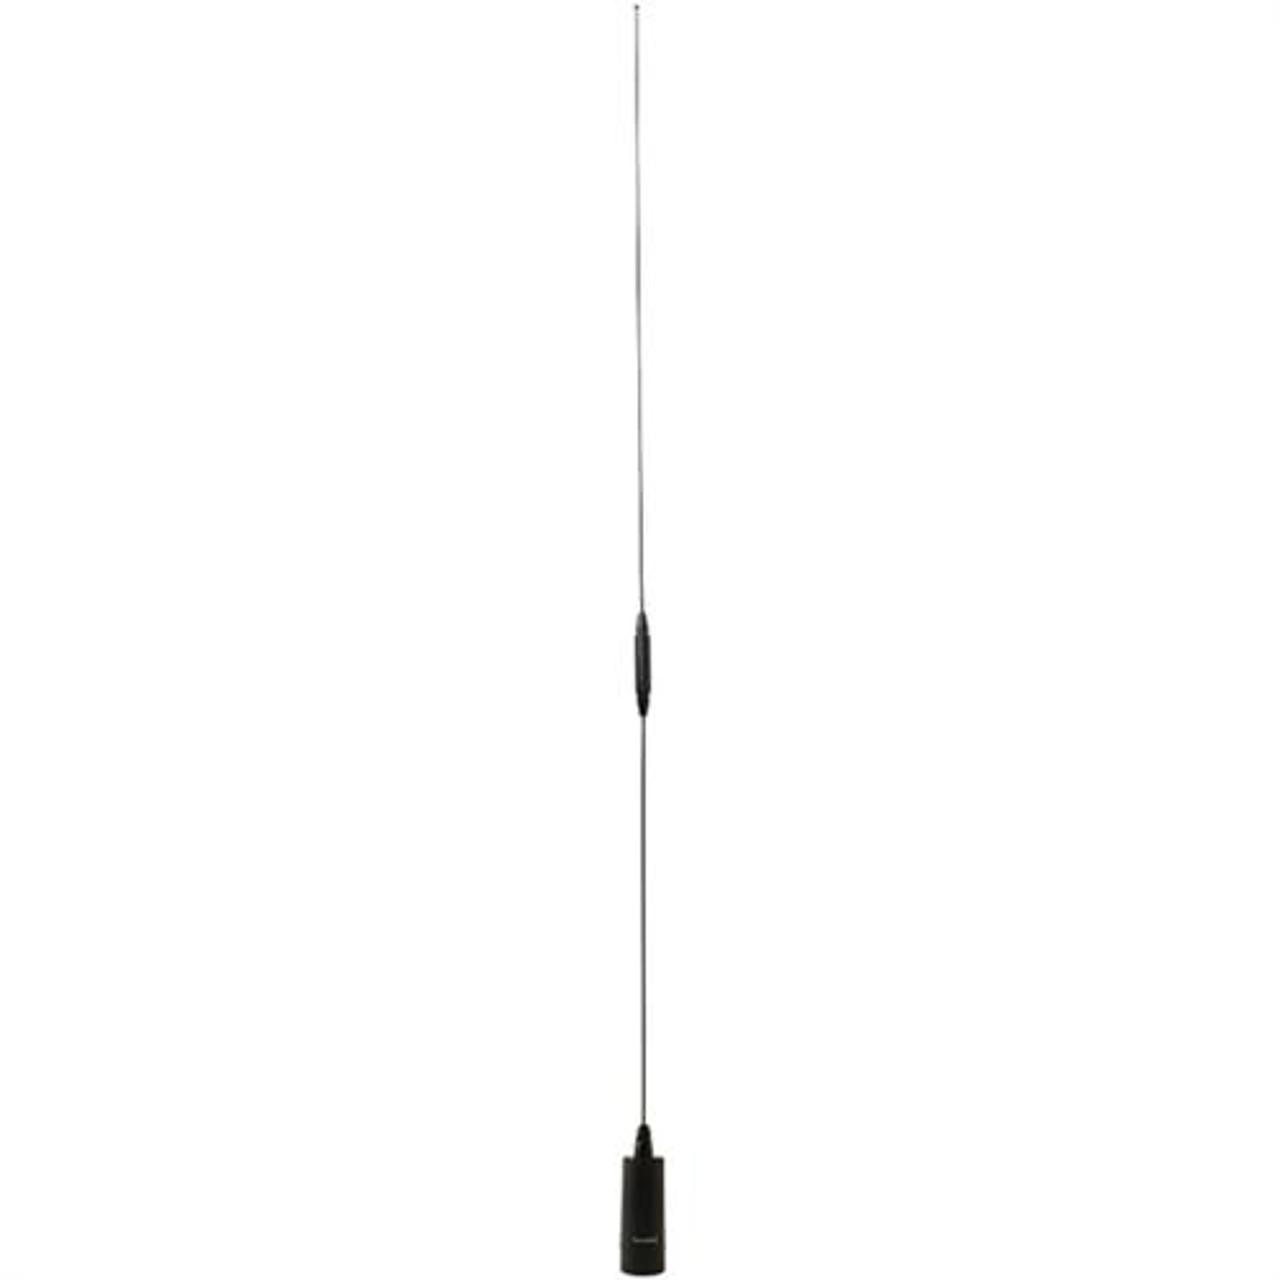 Tram Dual Band NMO Antenna - Black